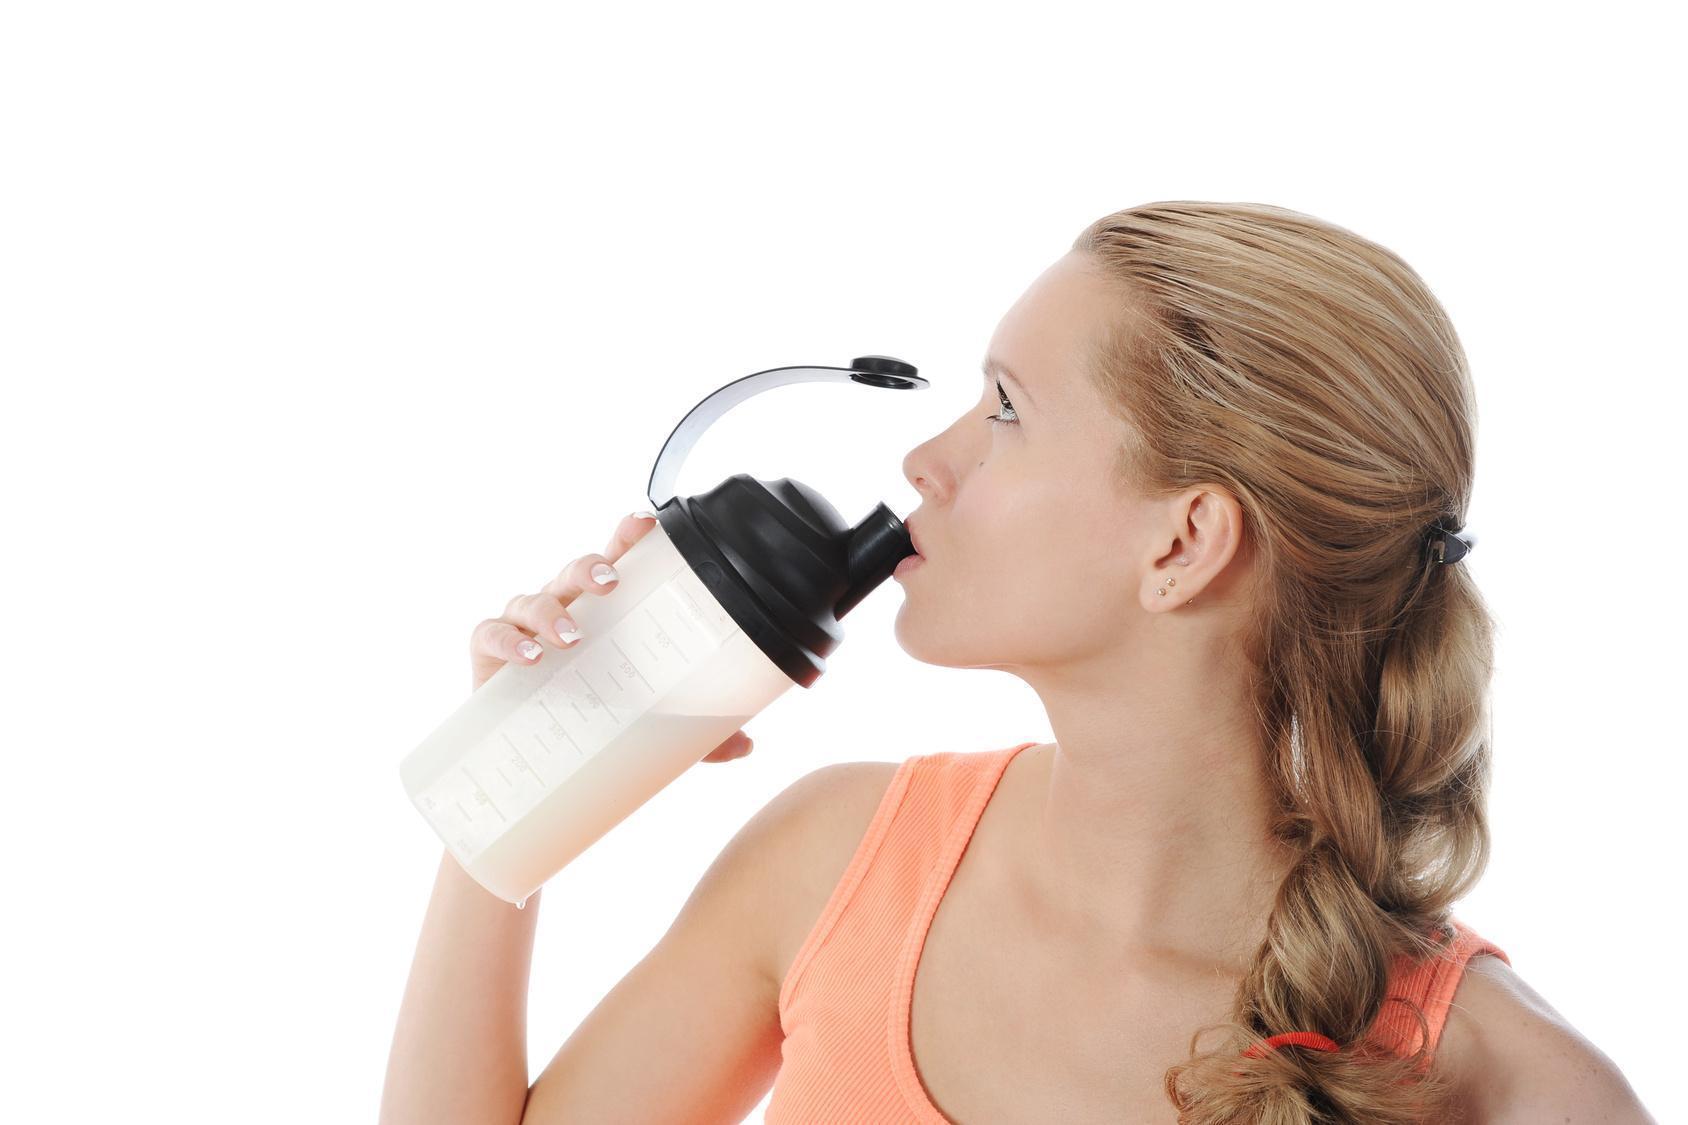 Como Tomar Shakes de Proteína Após O Treinamento